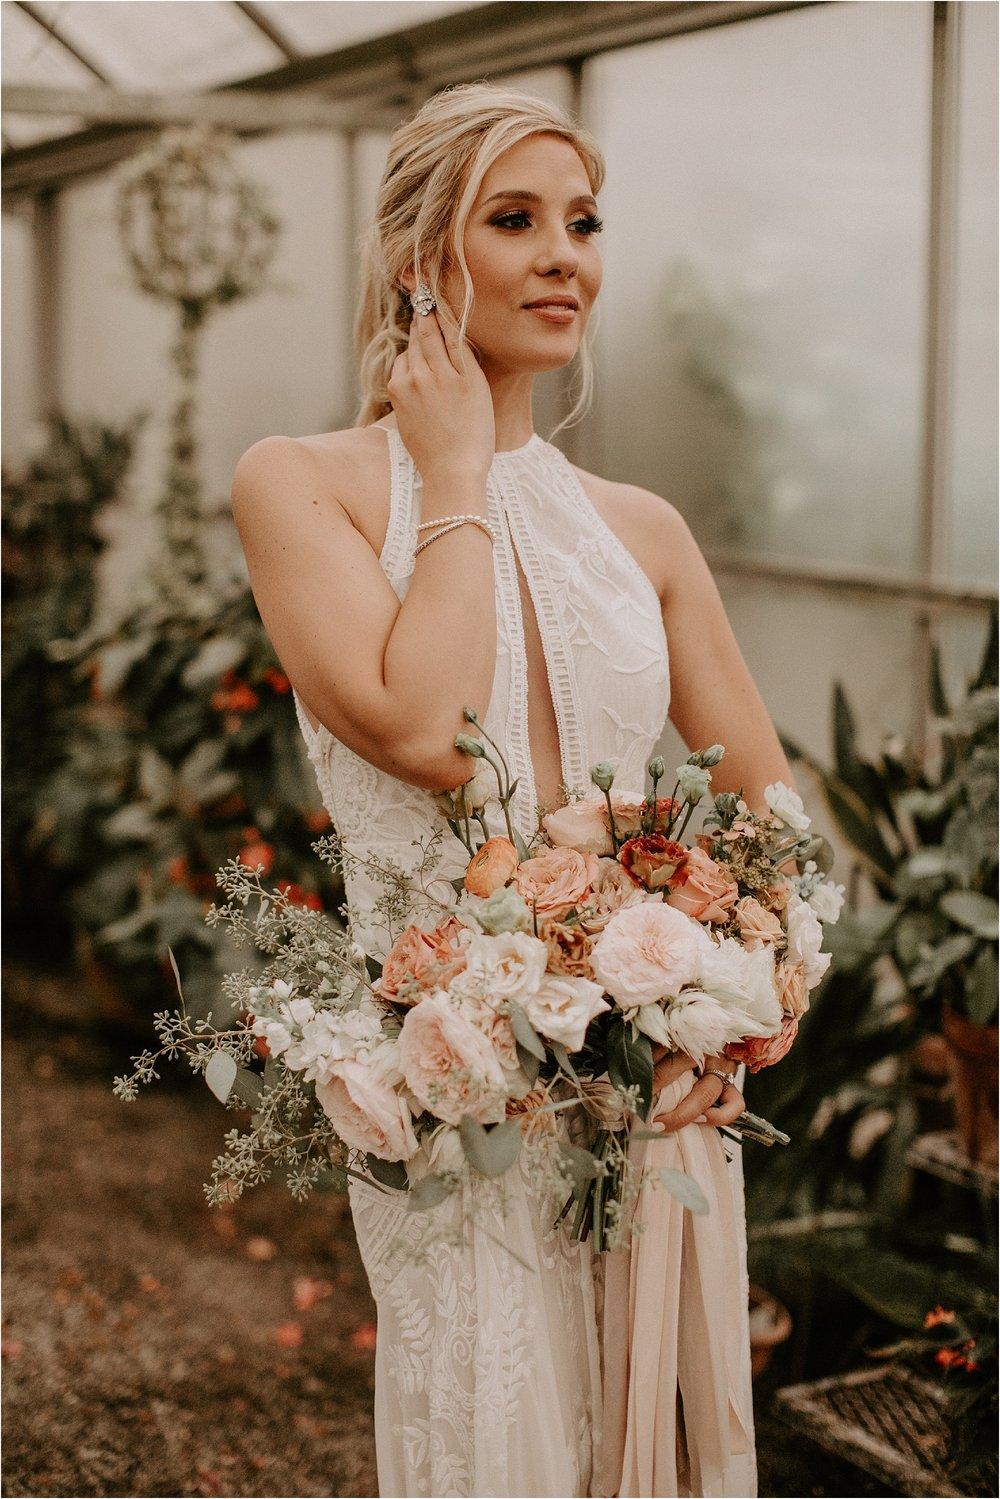 Sarah_Brookhart_Hortulus_Farm_Garden_and_Nursey_Wedding_Photographer_0033.jpg